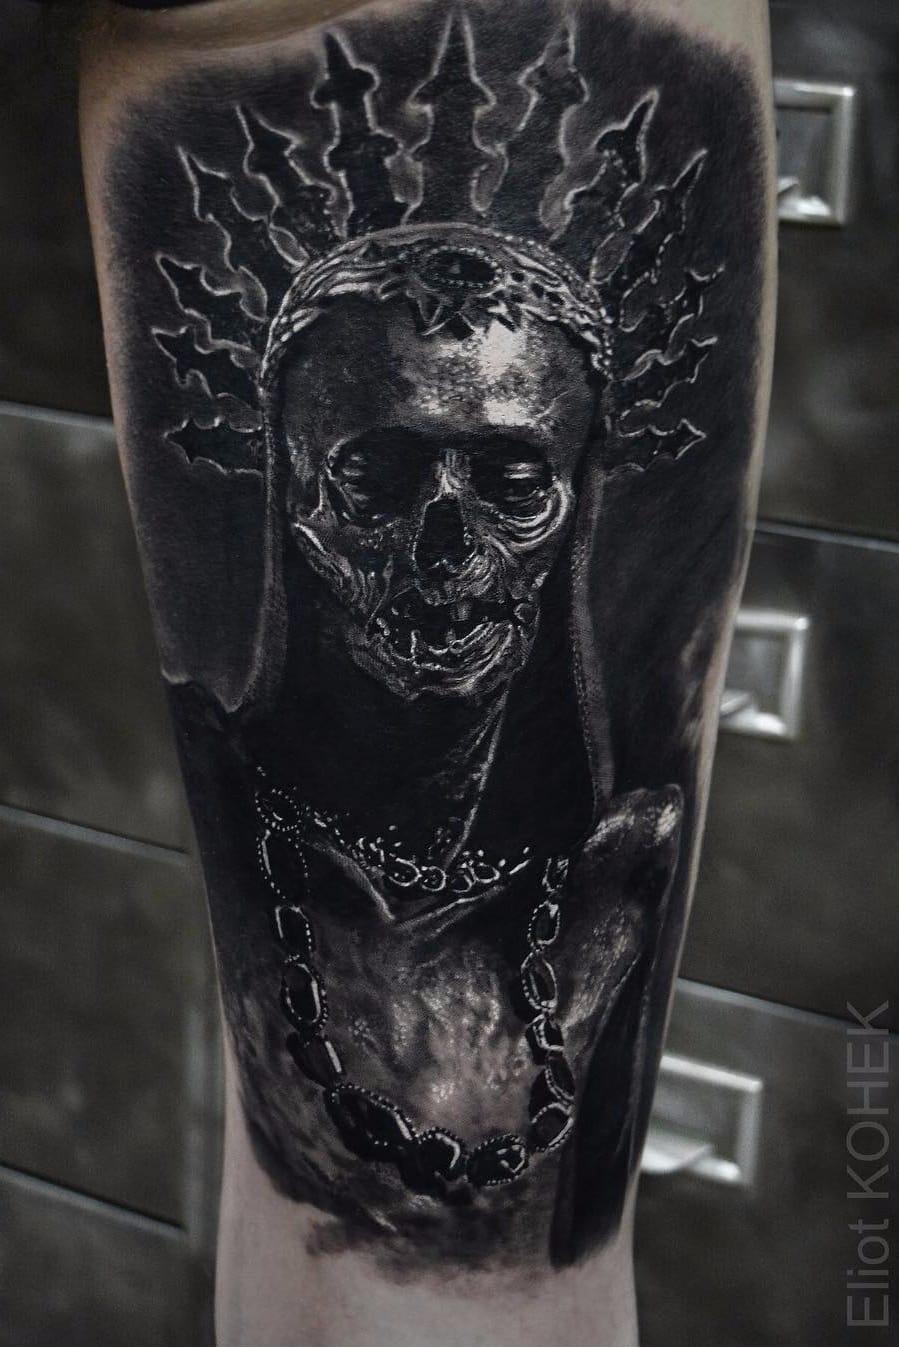 Por Eliot Kohek #EliotKohek #gringo #realismo #realism #pretoecinza #blackandgrey #skull #caveira #coroa #crown #joias #jewelry #dark #horror #terror